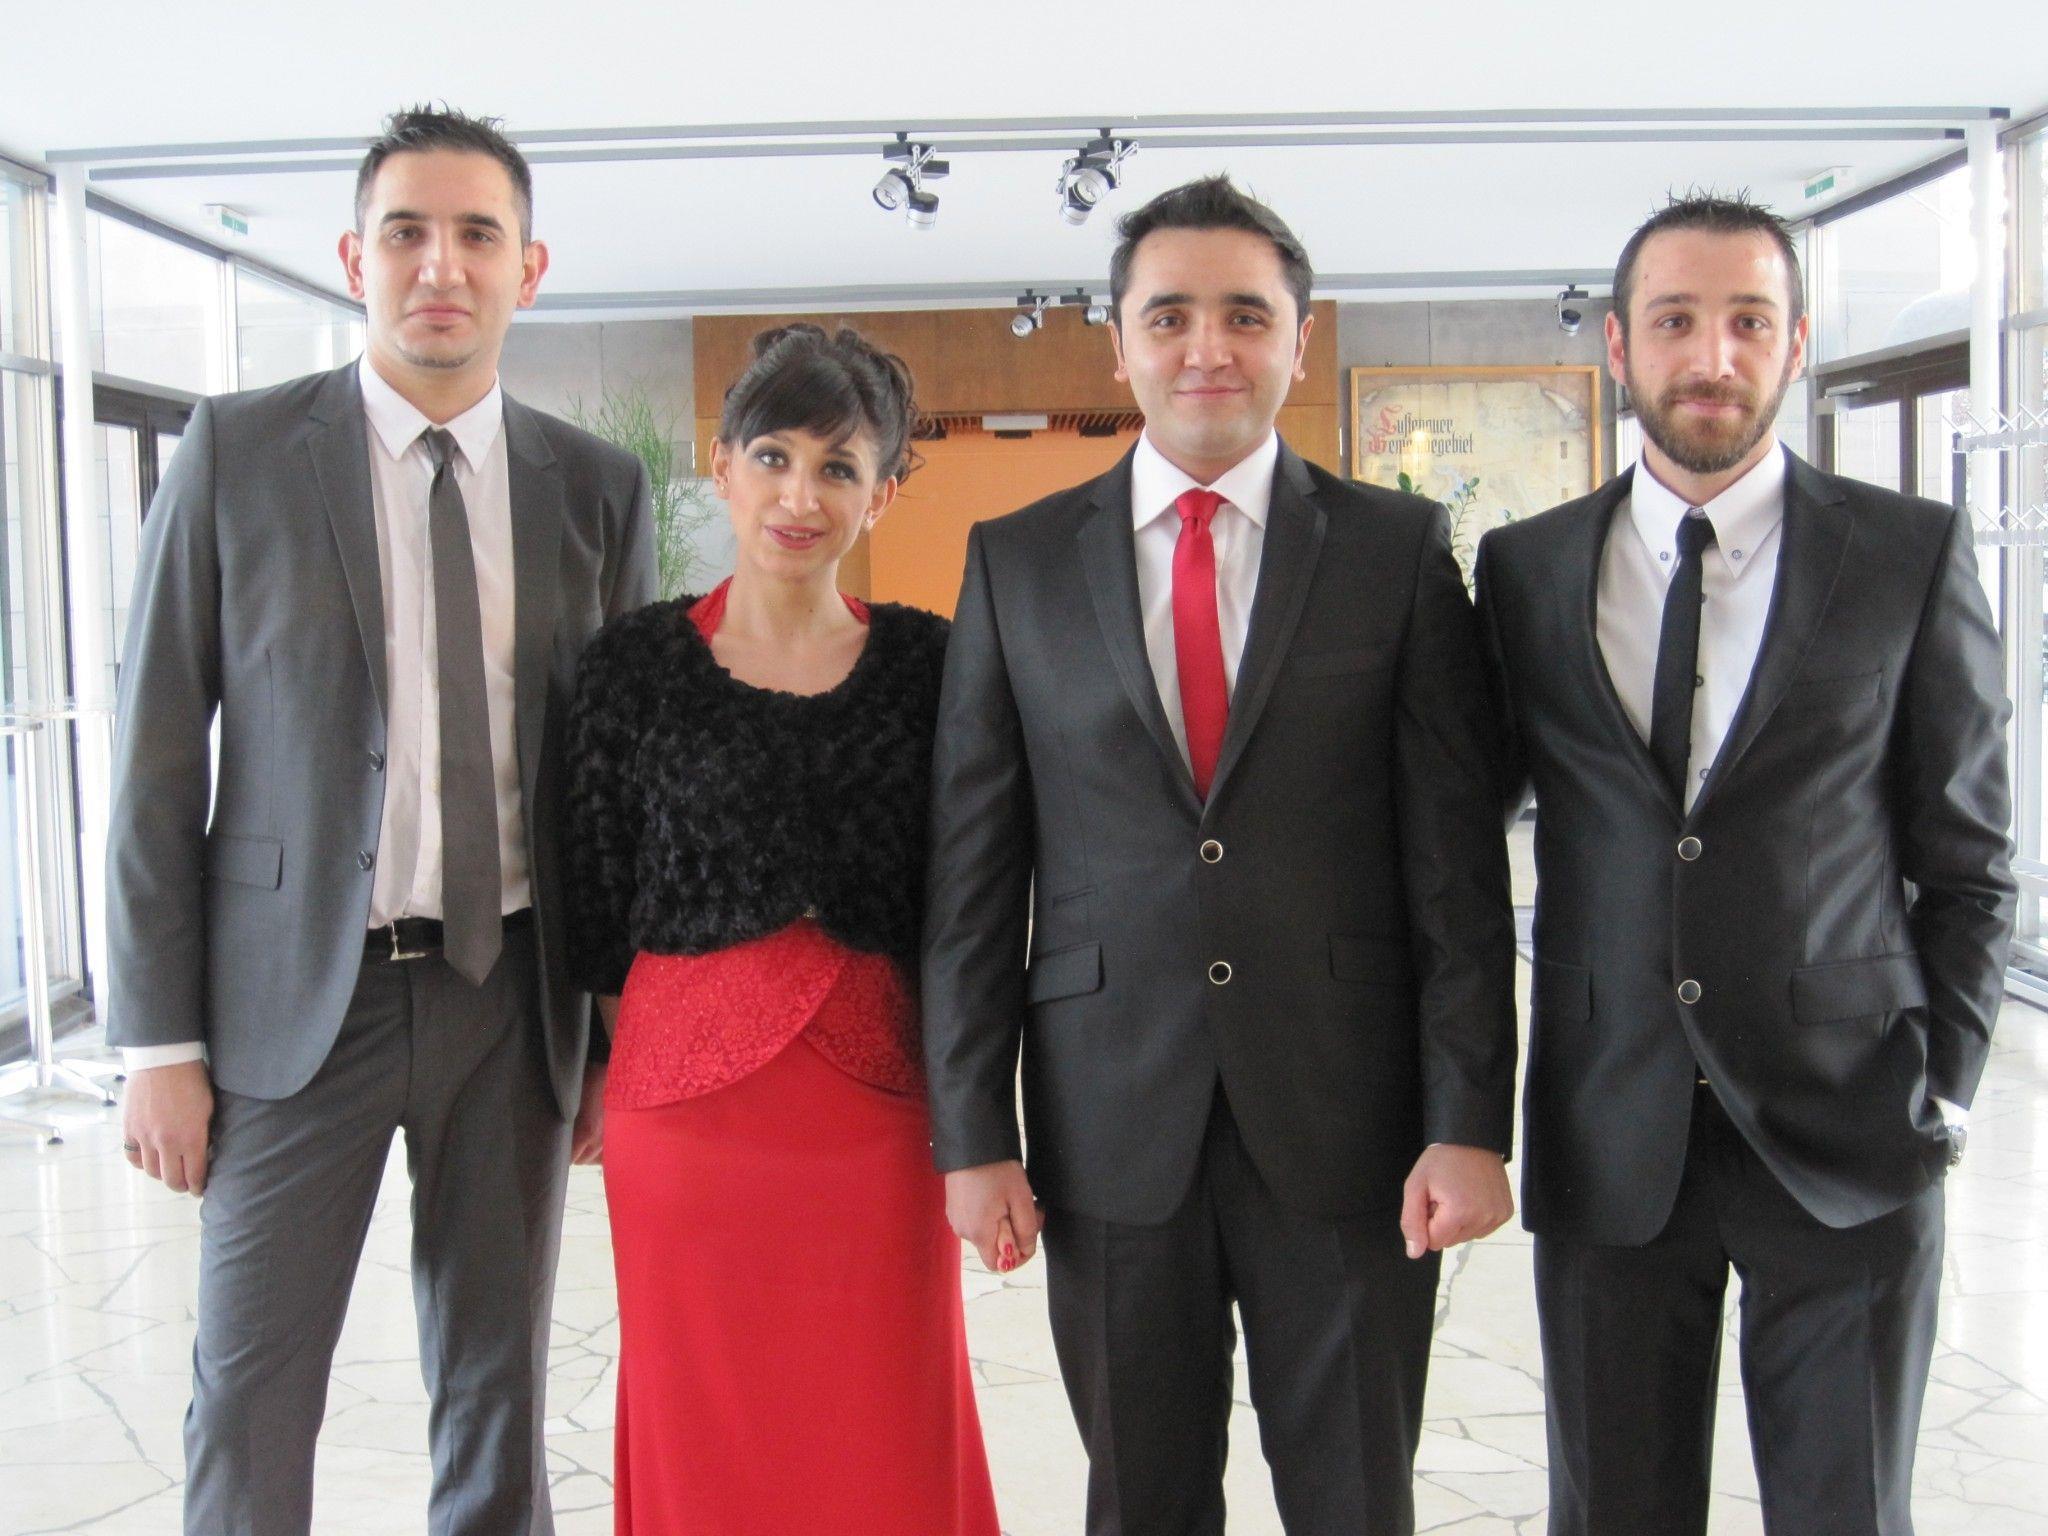 Burcin Salkan und Mustafa Ulus haben geheiratet